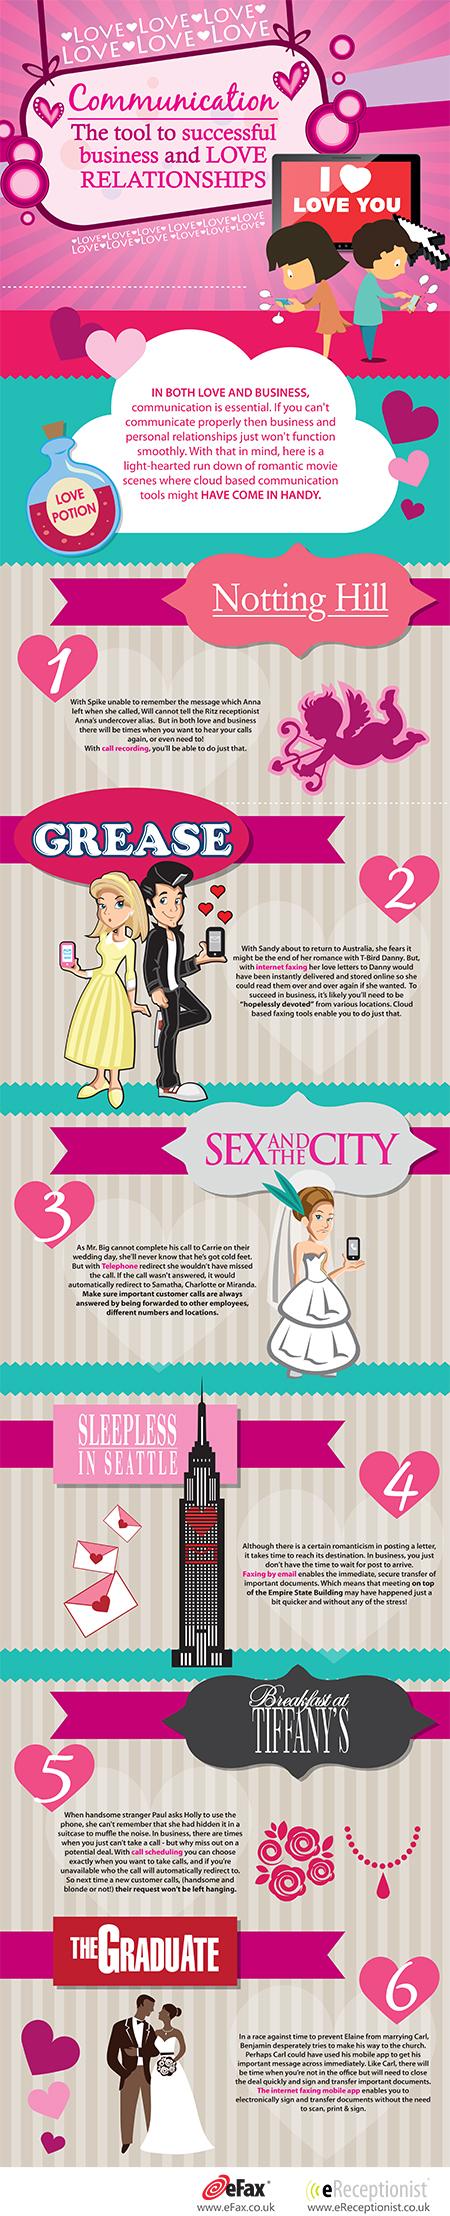 Valentines_Day_Infographic.jpg